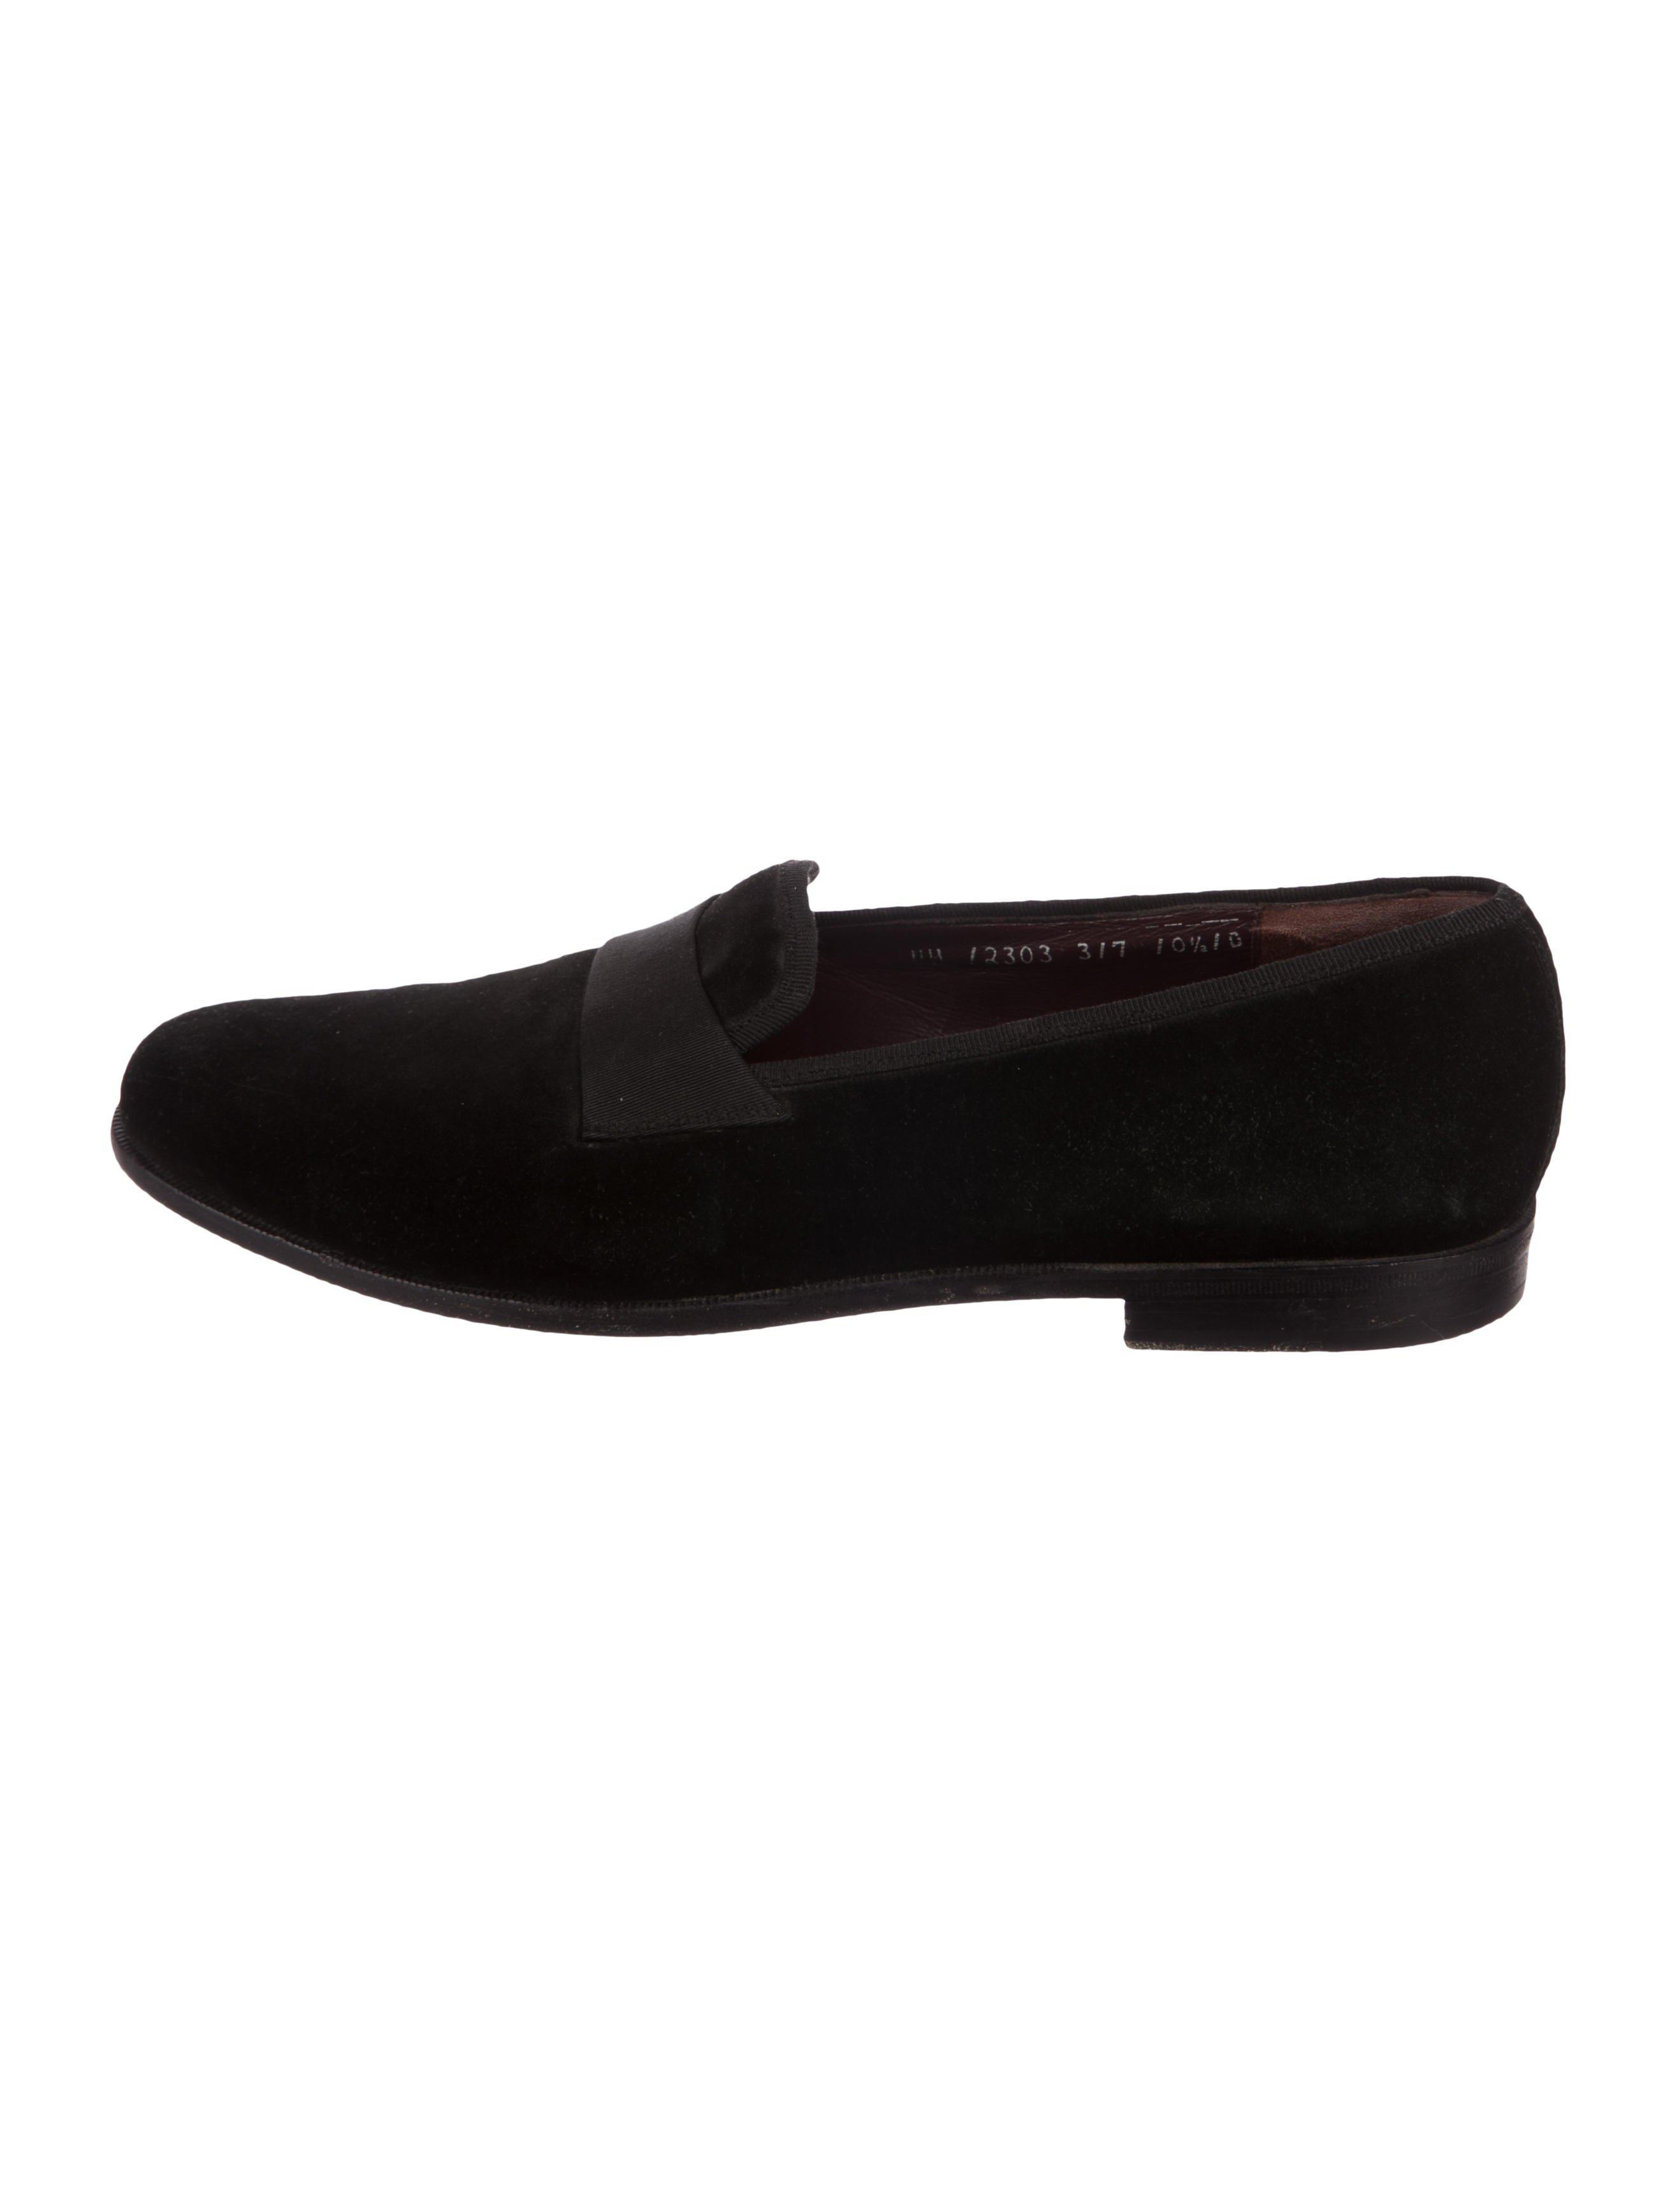 ab889b6cbf3d Ferragamo - Black Suede Smoking Slippers for Men - Lyst. View fullscreen